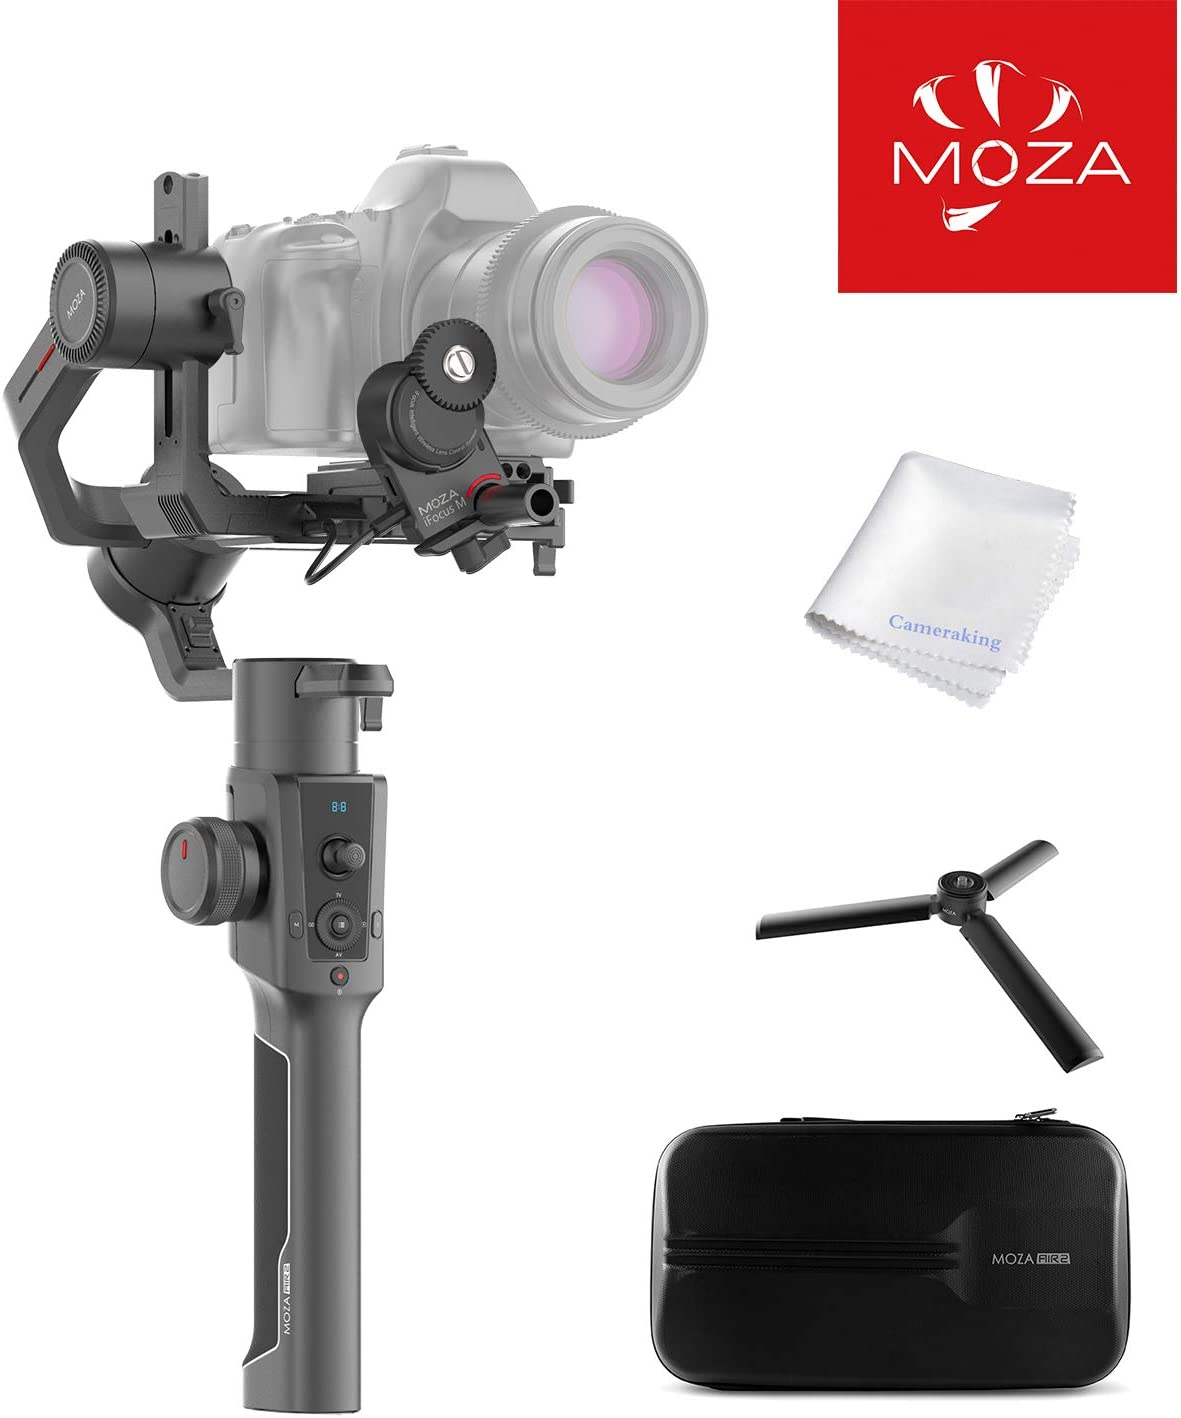 Moza MFM01 iFocus-M Wireless Lens Motor